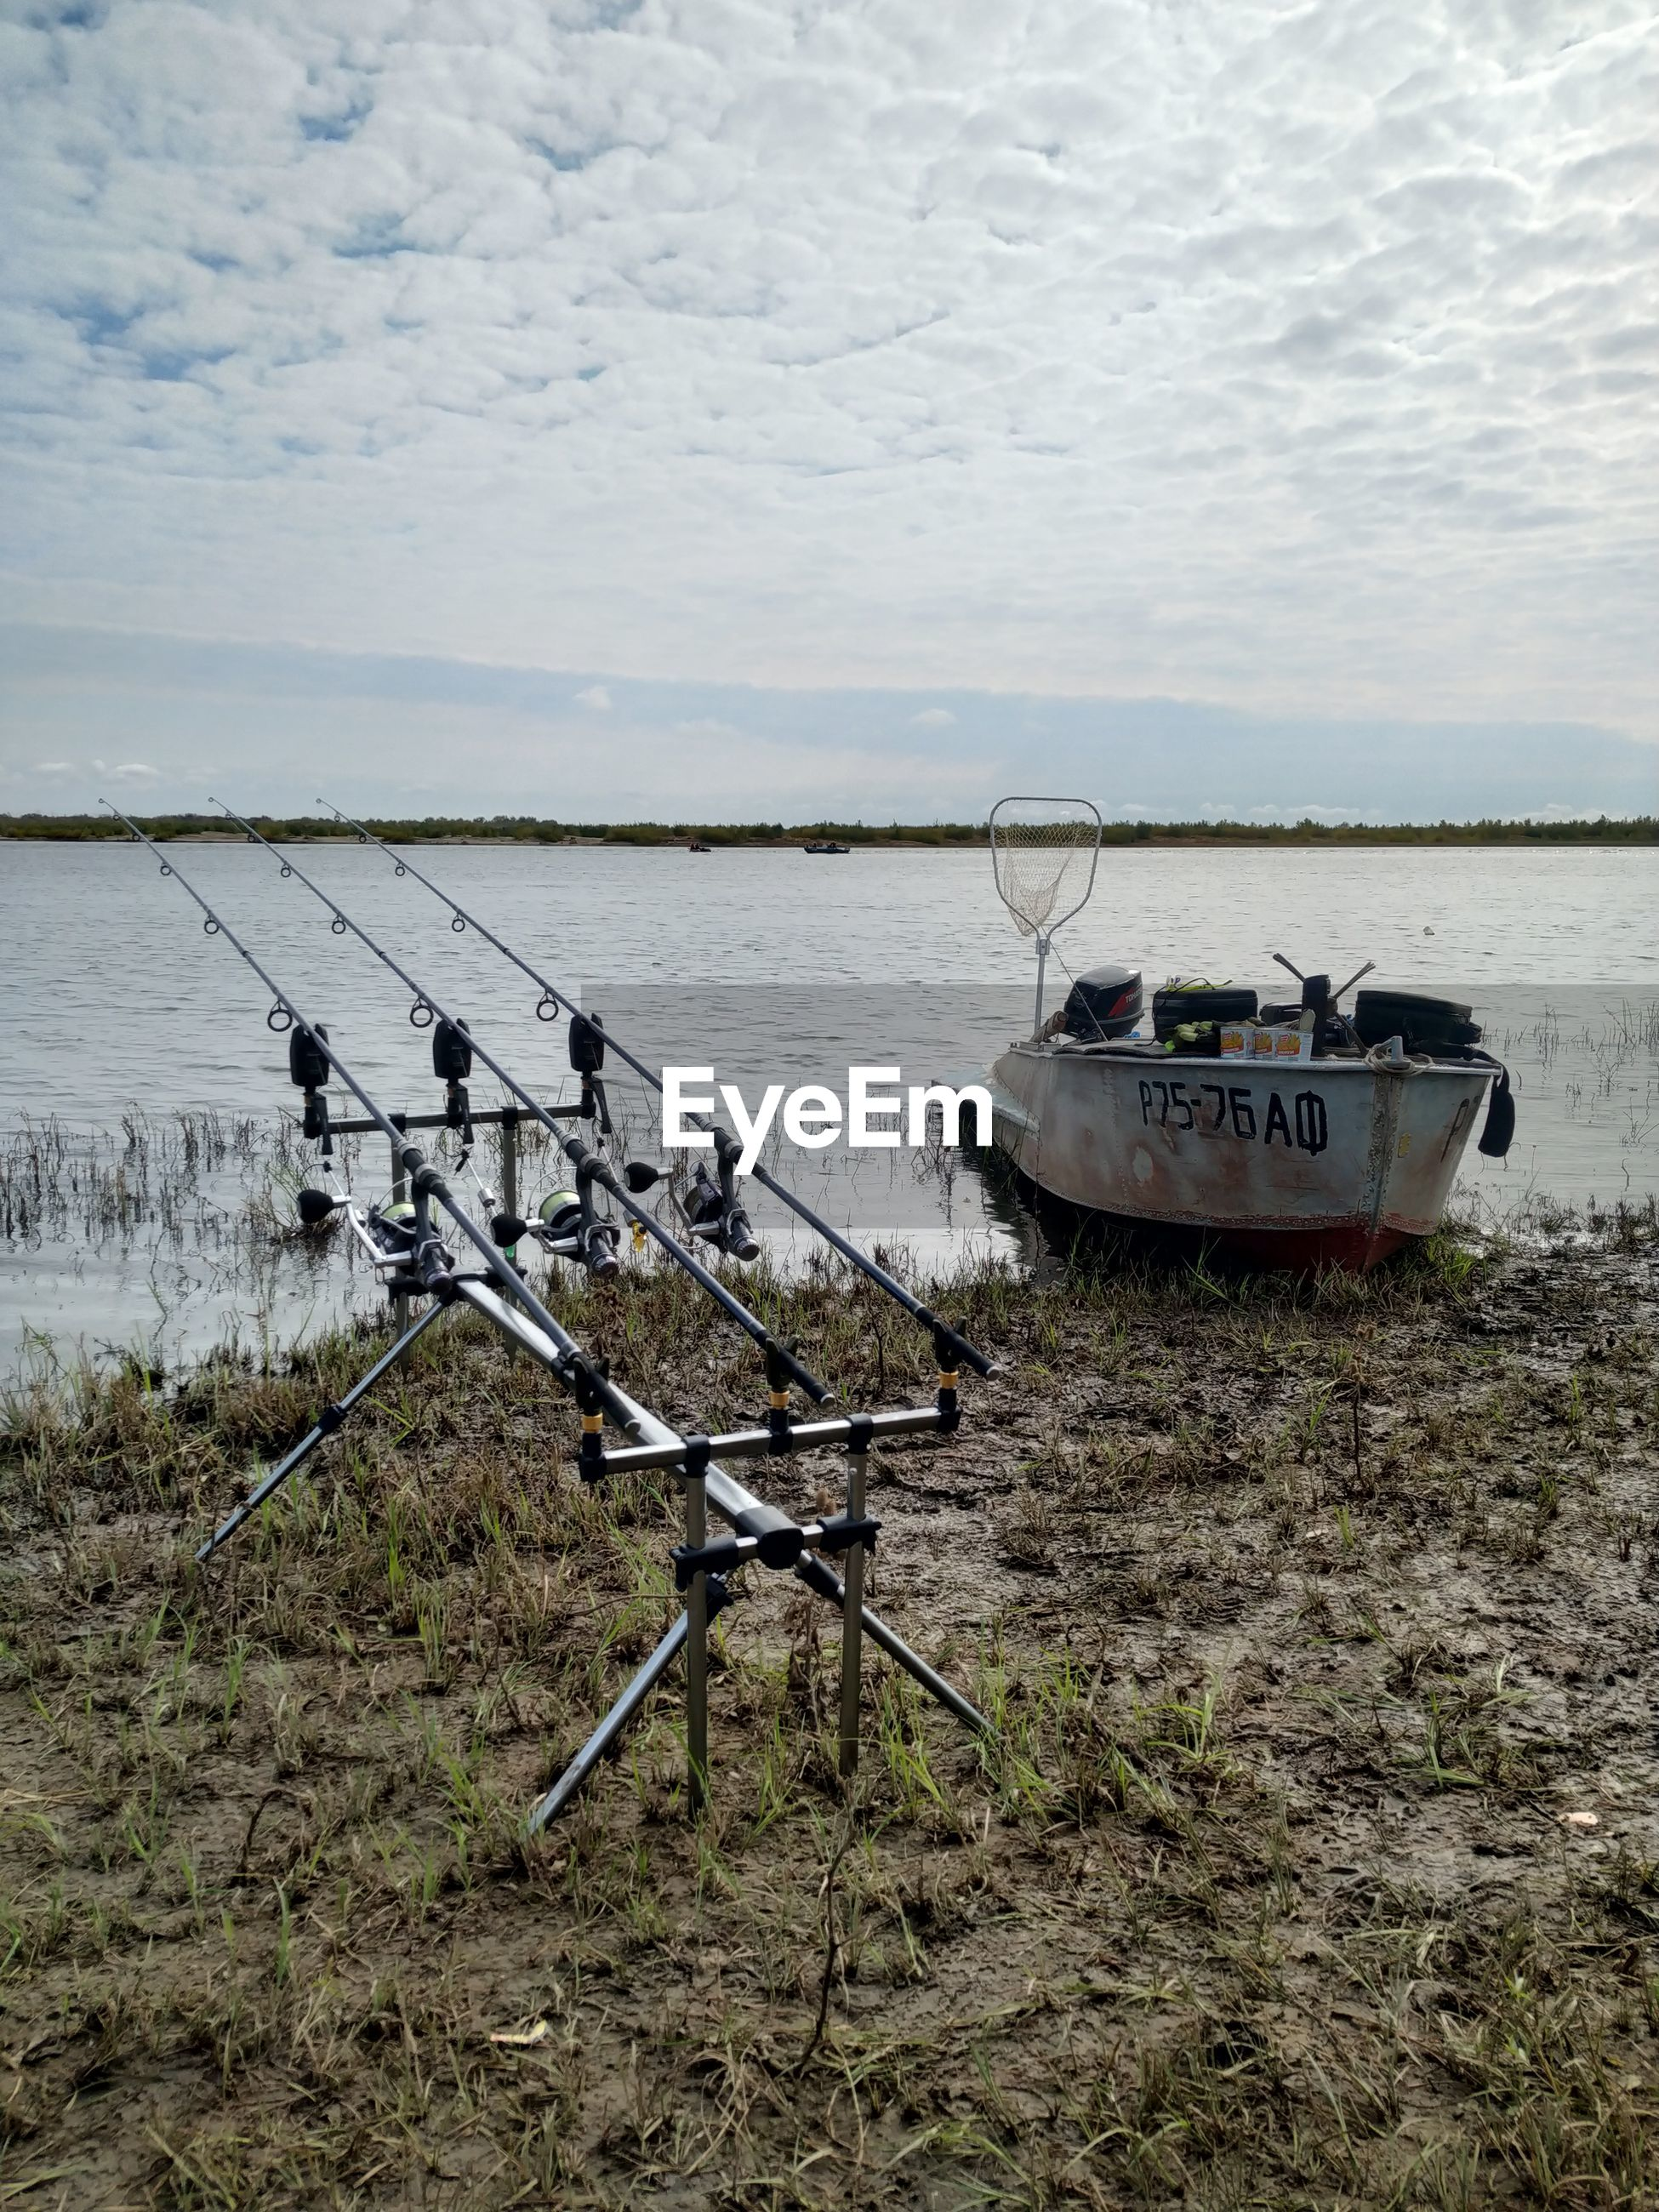 FISHING BOAT MOORED ON SHORE AGAINST SKY